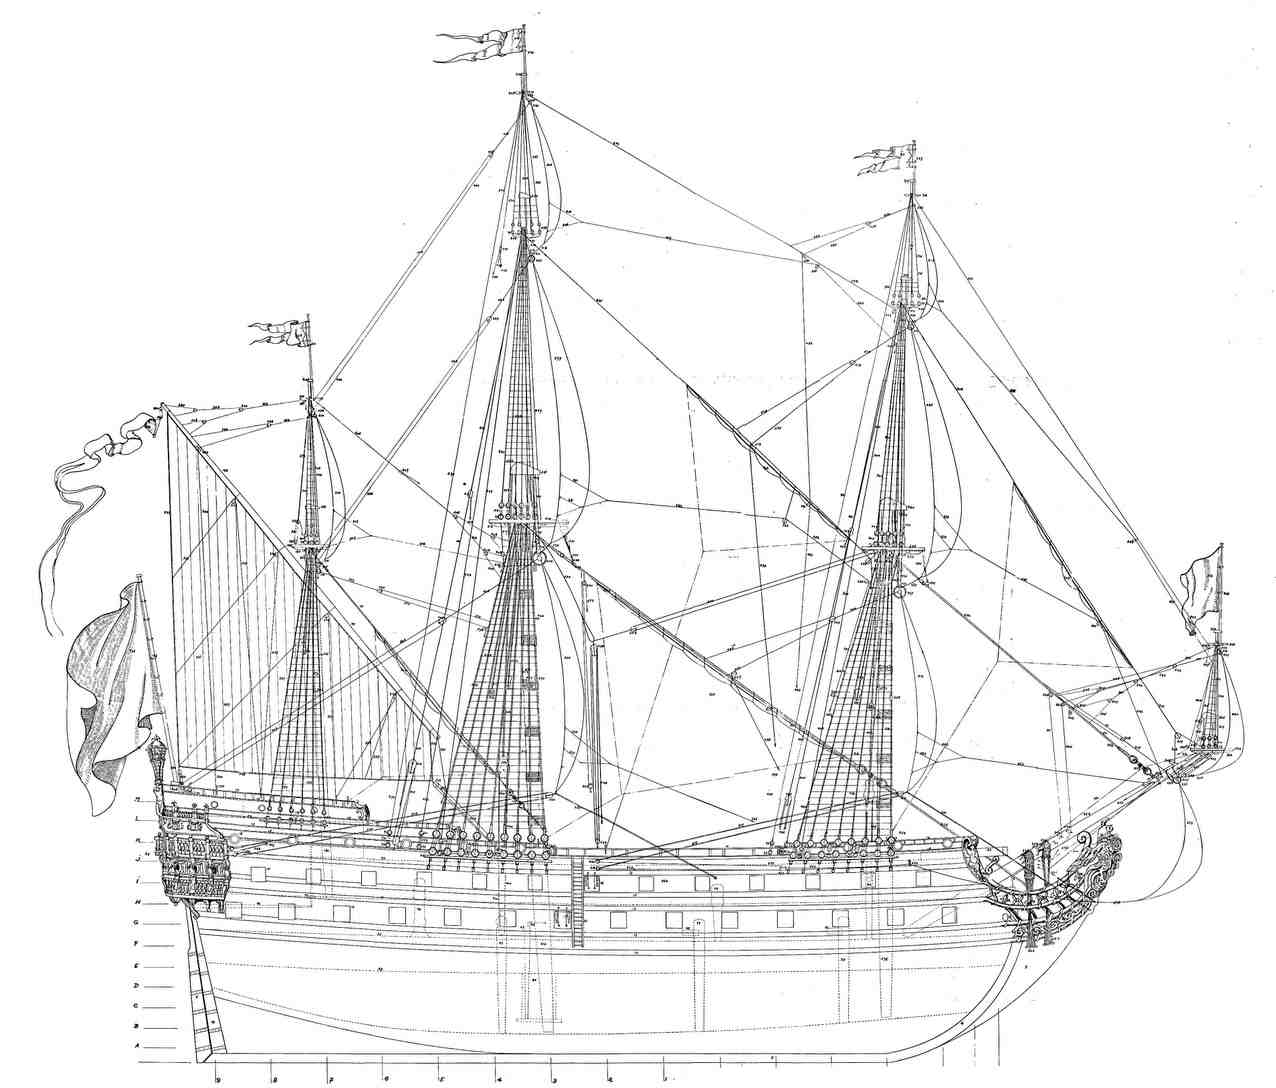 корабль le phenix, французский флот, французское судно